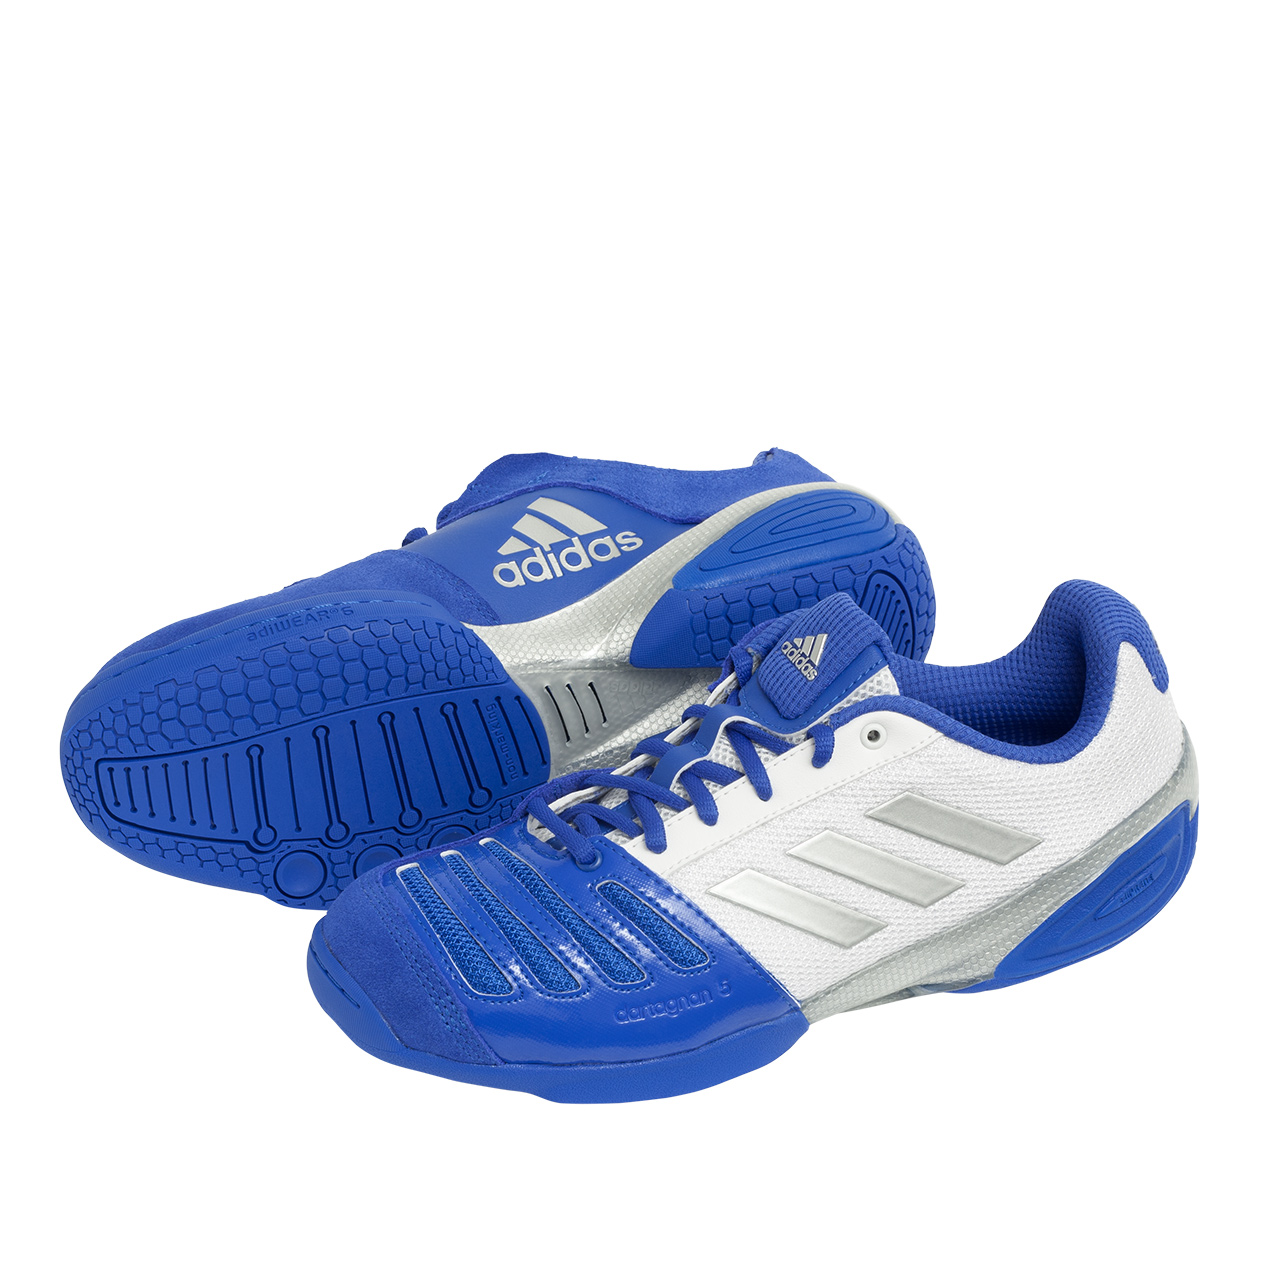 "Adidas Fechtschuh ""D'Artagnan V"", blau"